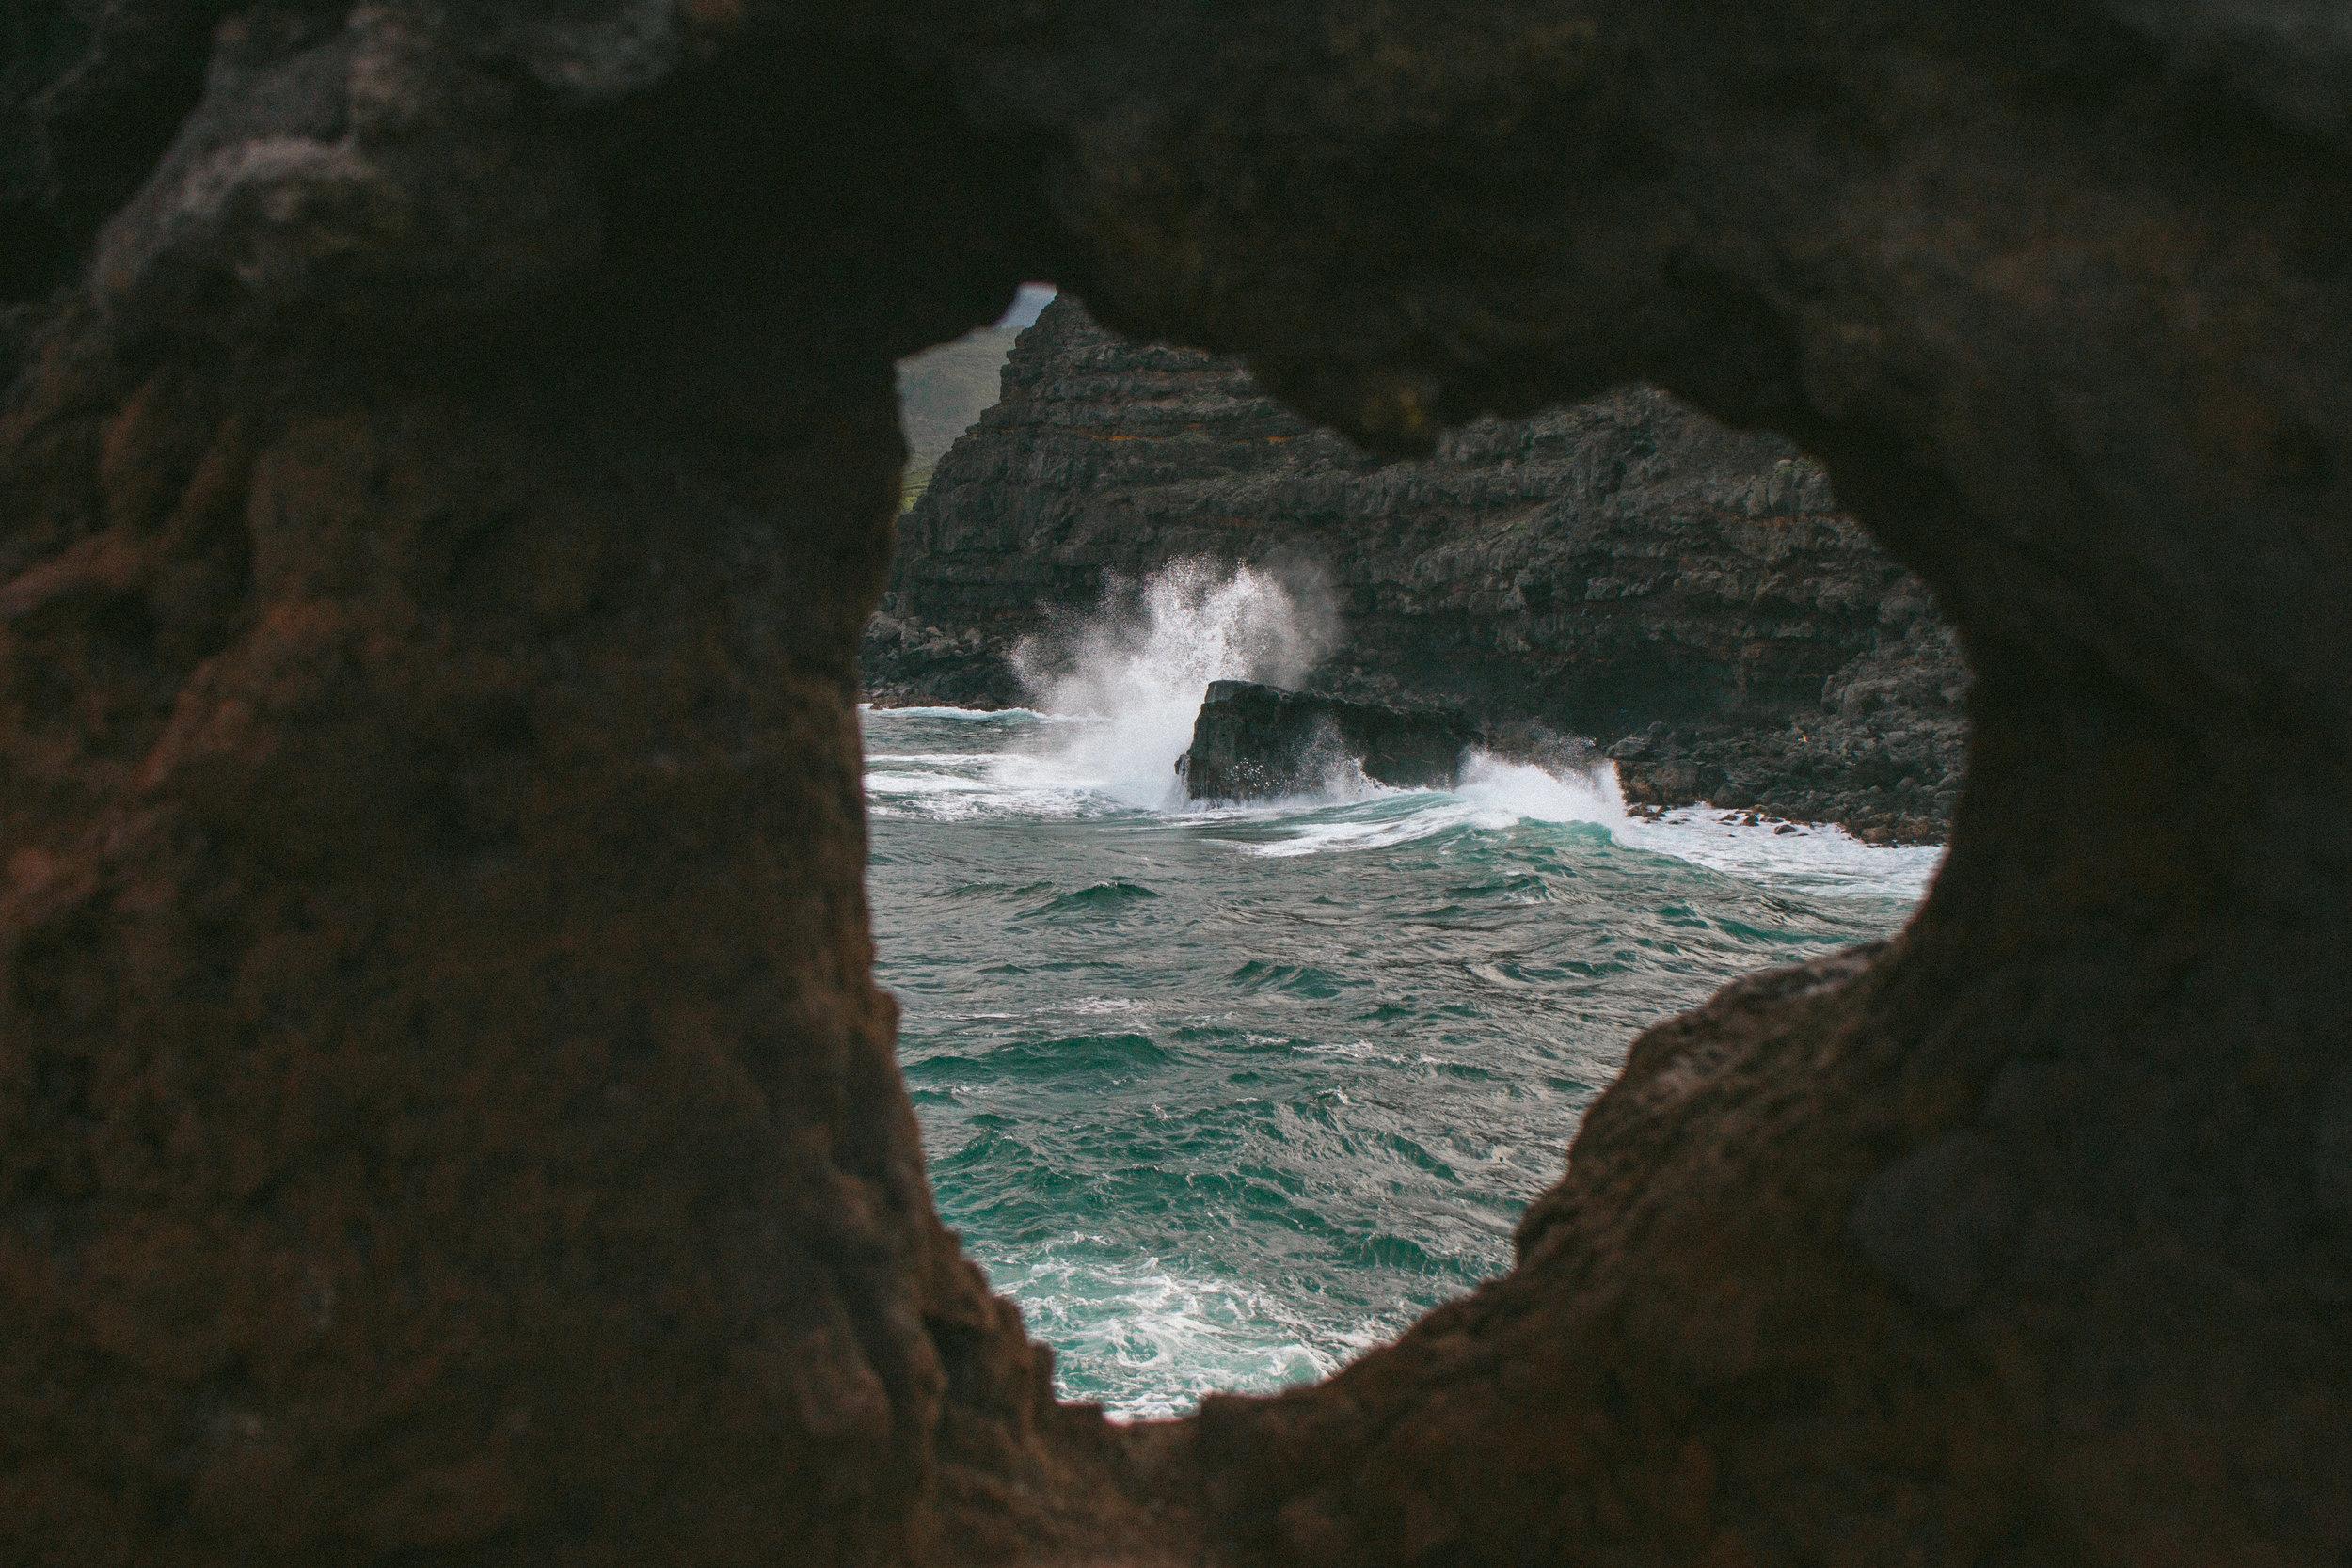 Hawaii October 2018-compressed-46.jpg